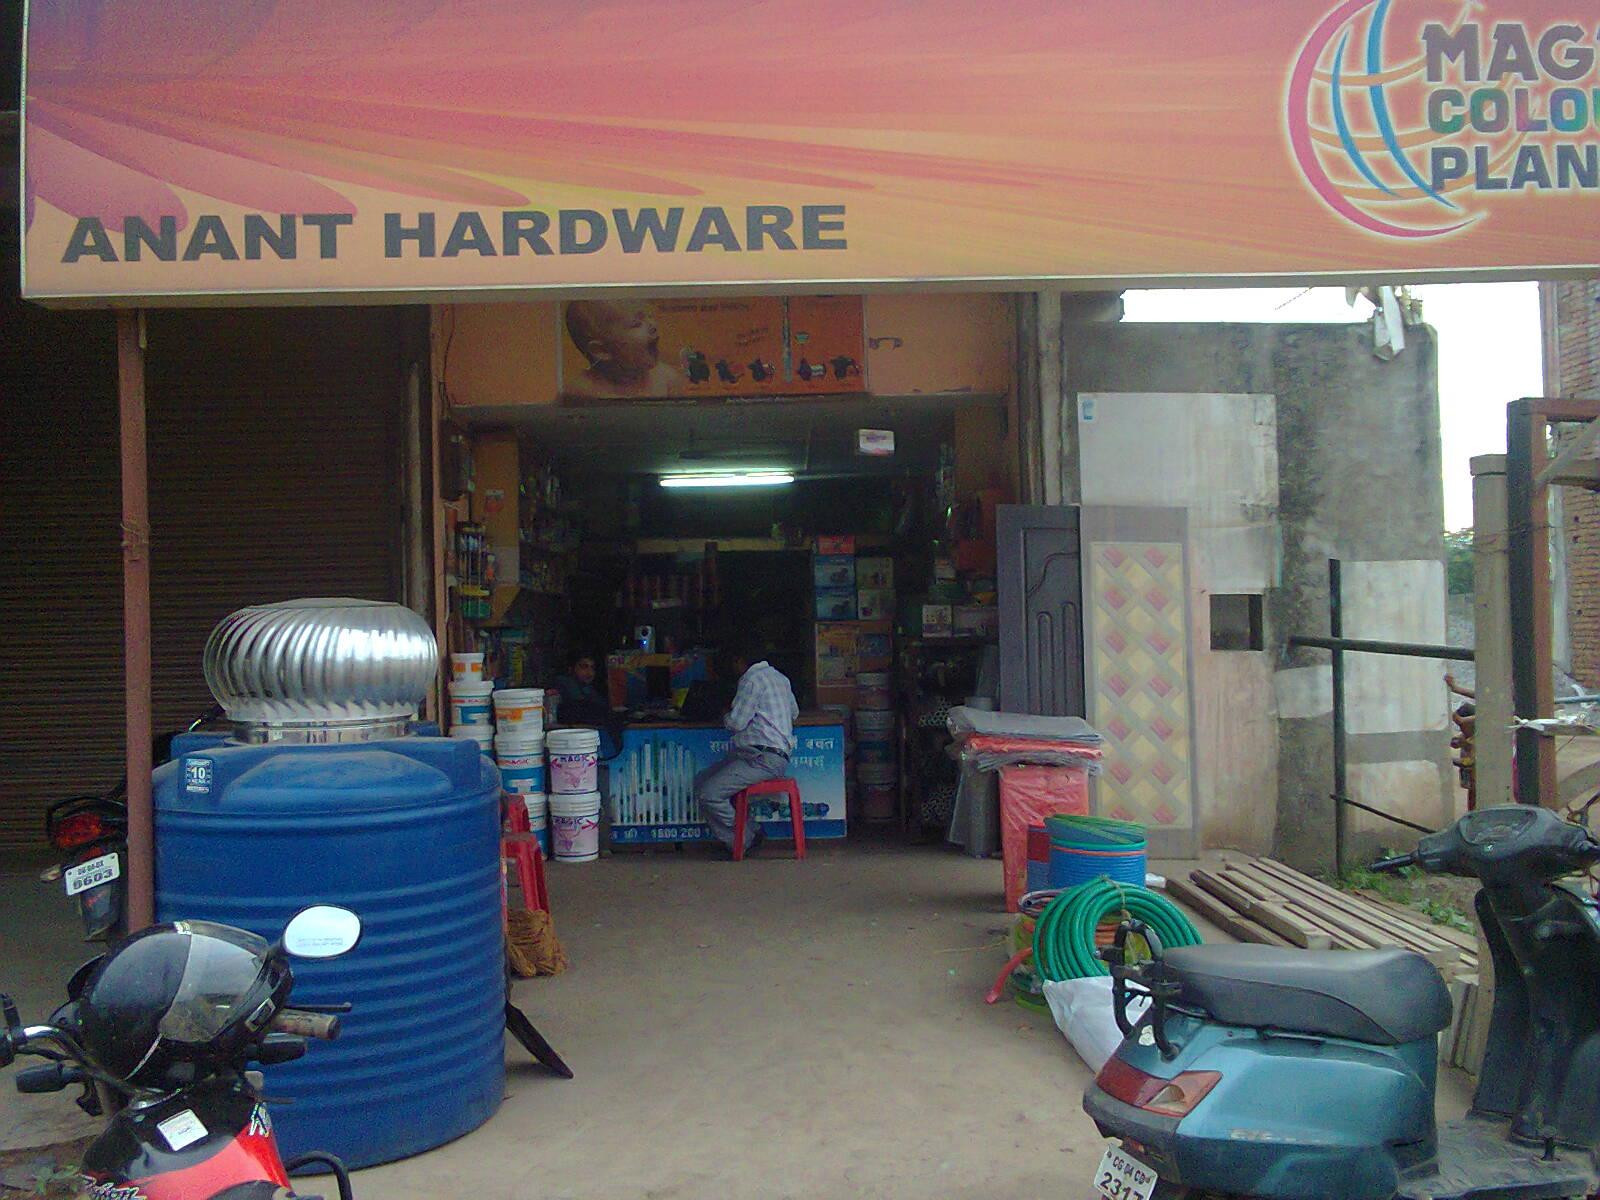 Anant Hardware